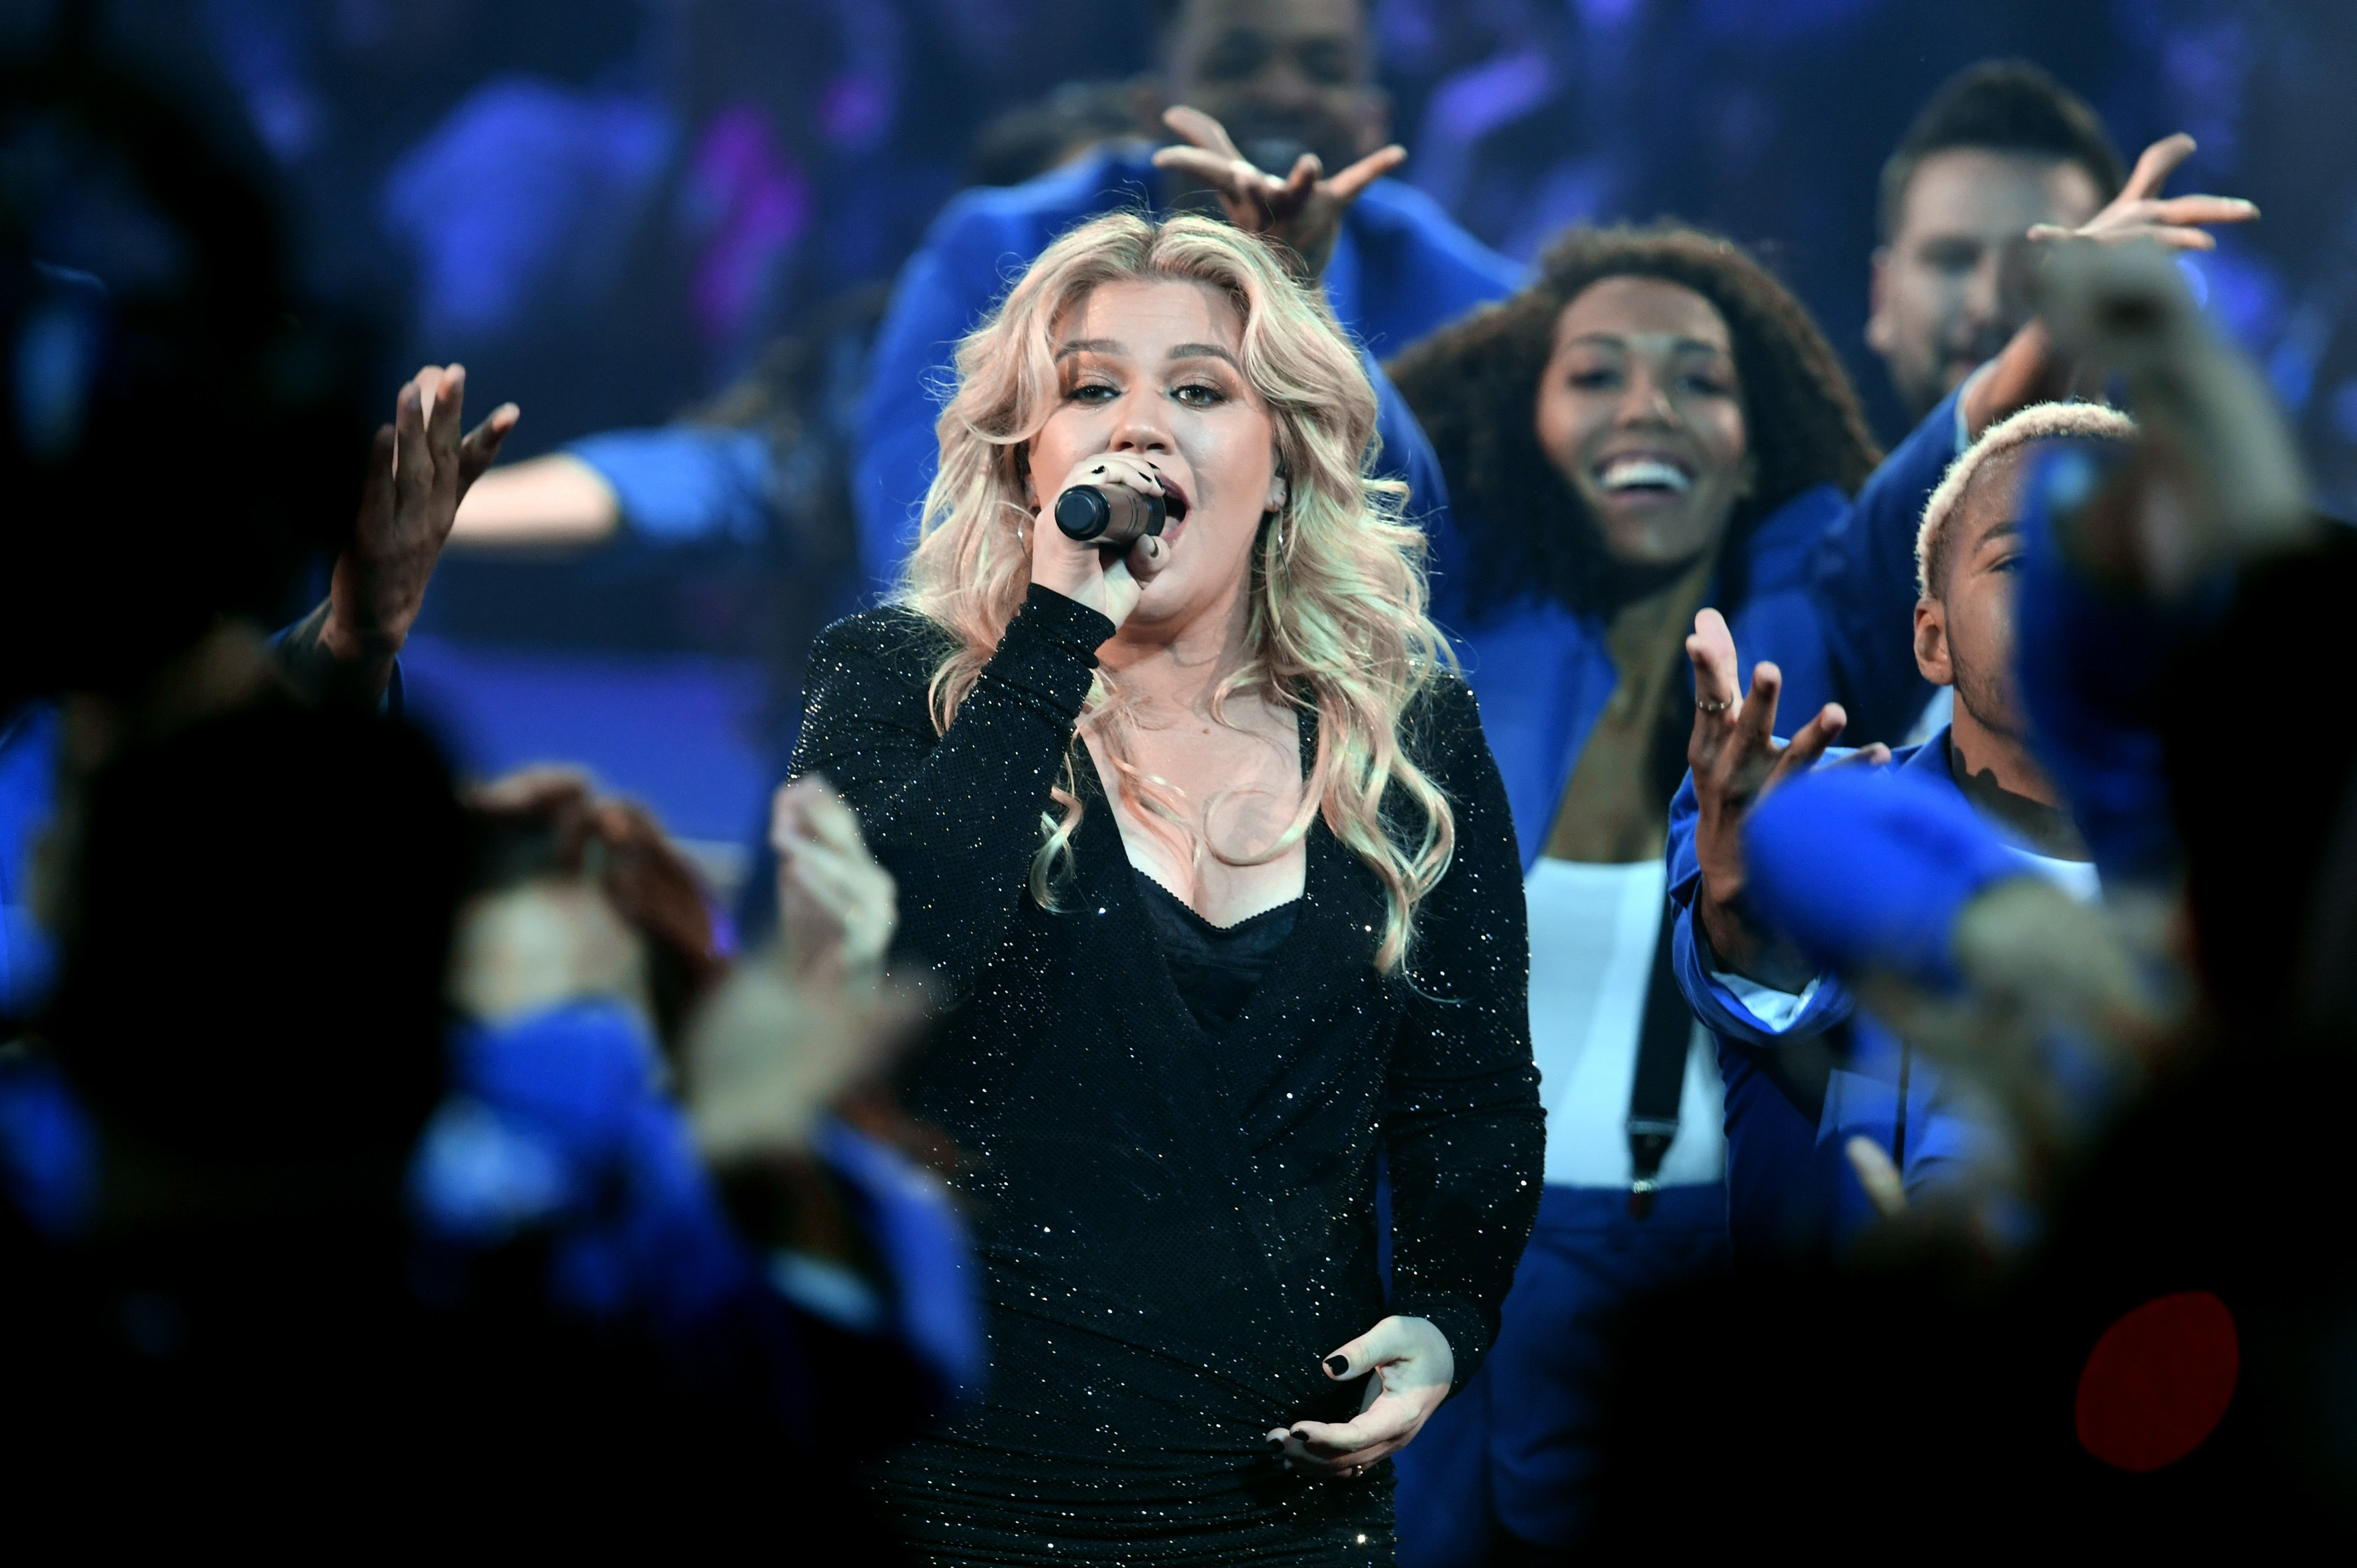 Kelly Clarkson's 2019 Billboard Music Awards Medley Was Jam